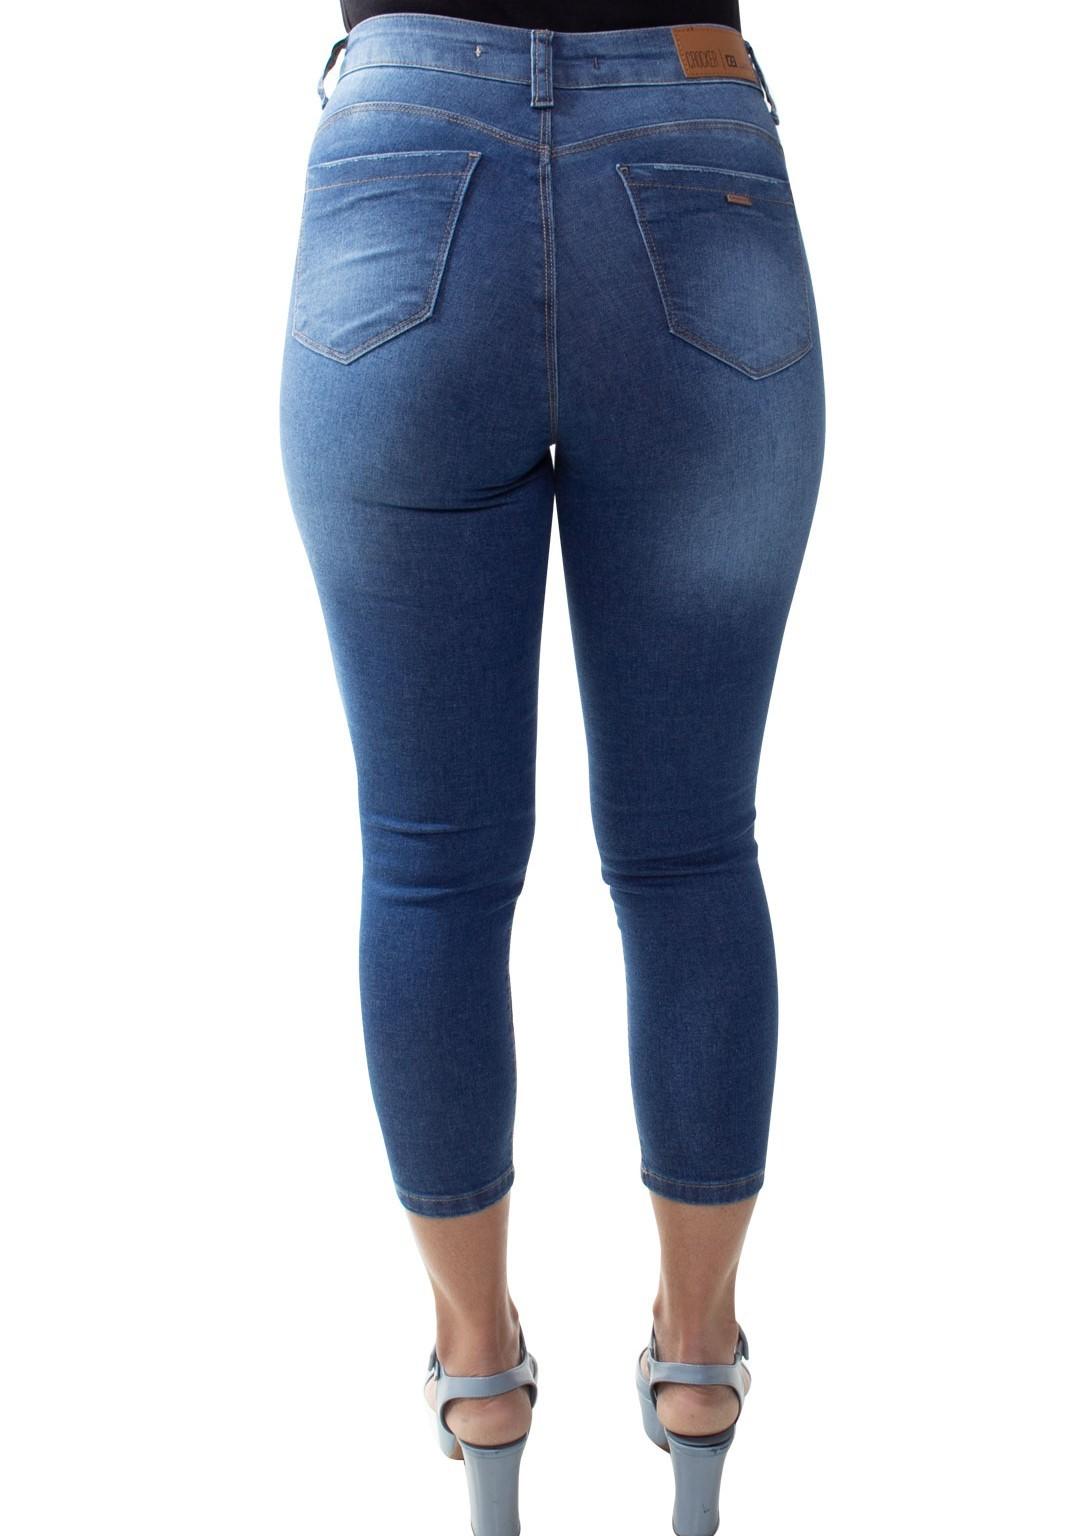 Calça Capri Jeans Feminina Crocker - 47748  - CROCKER JEANS